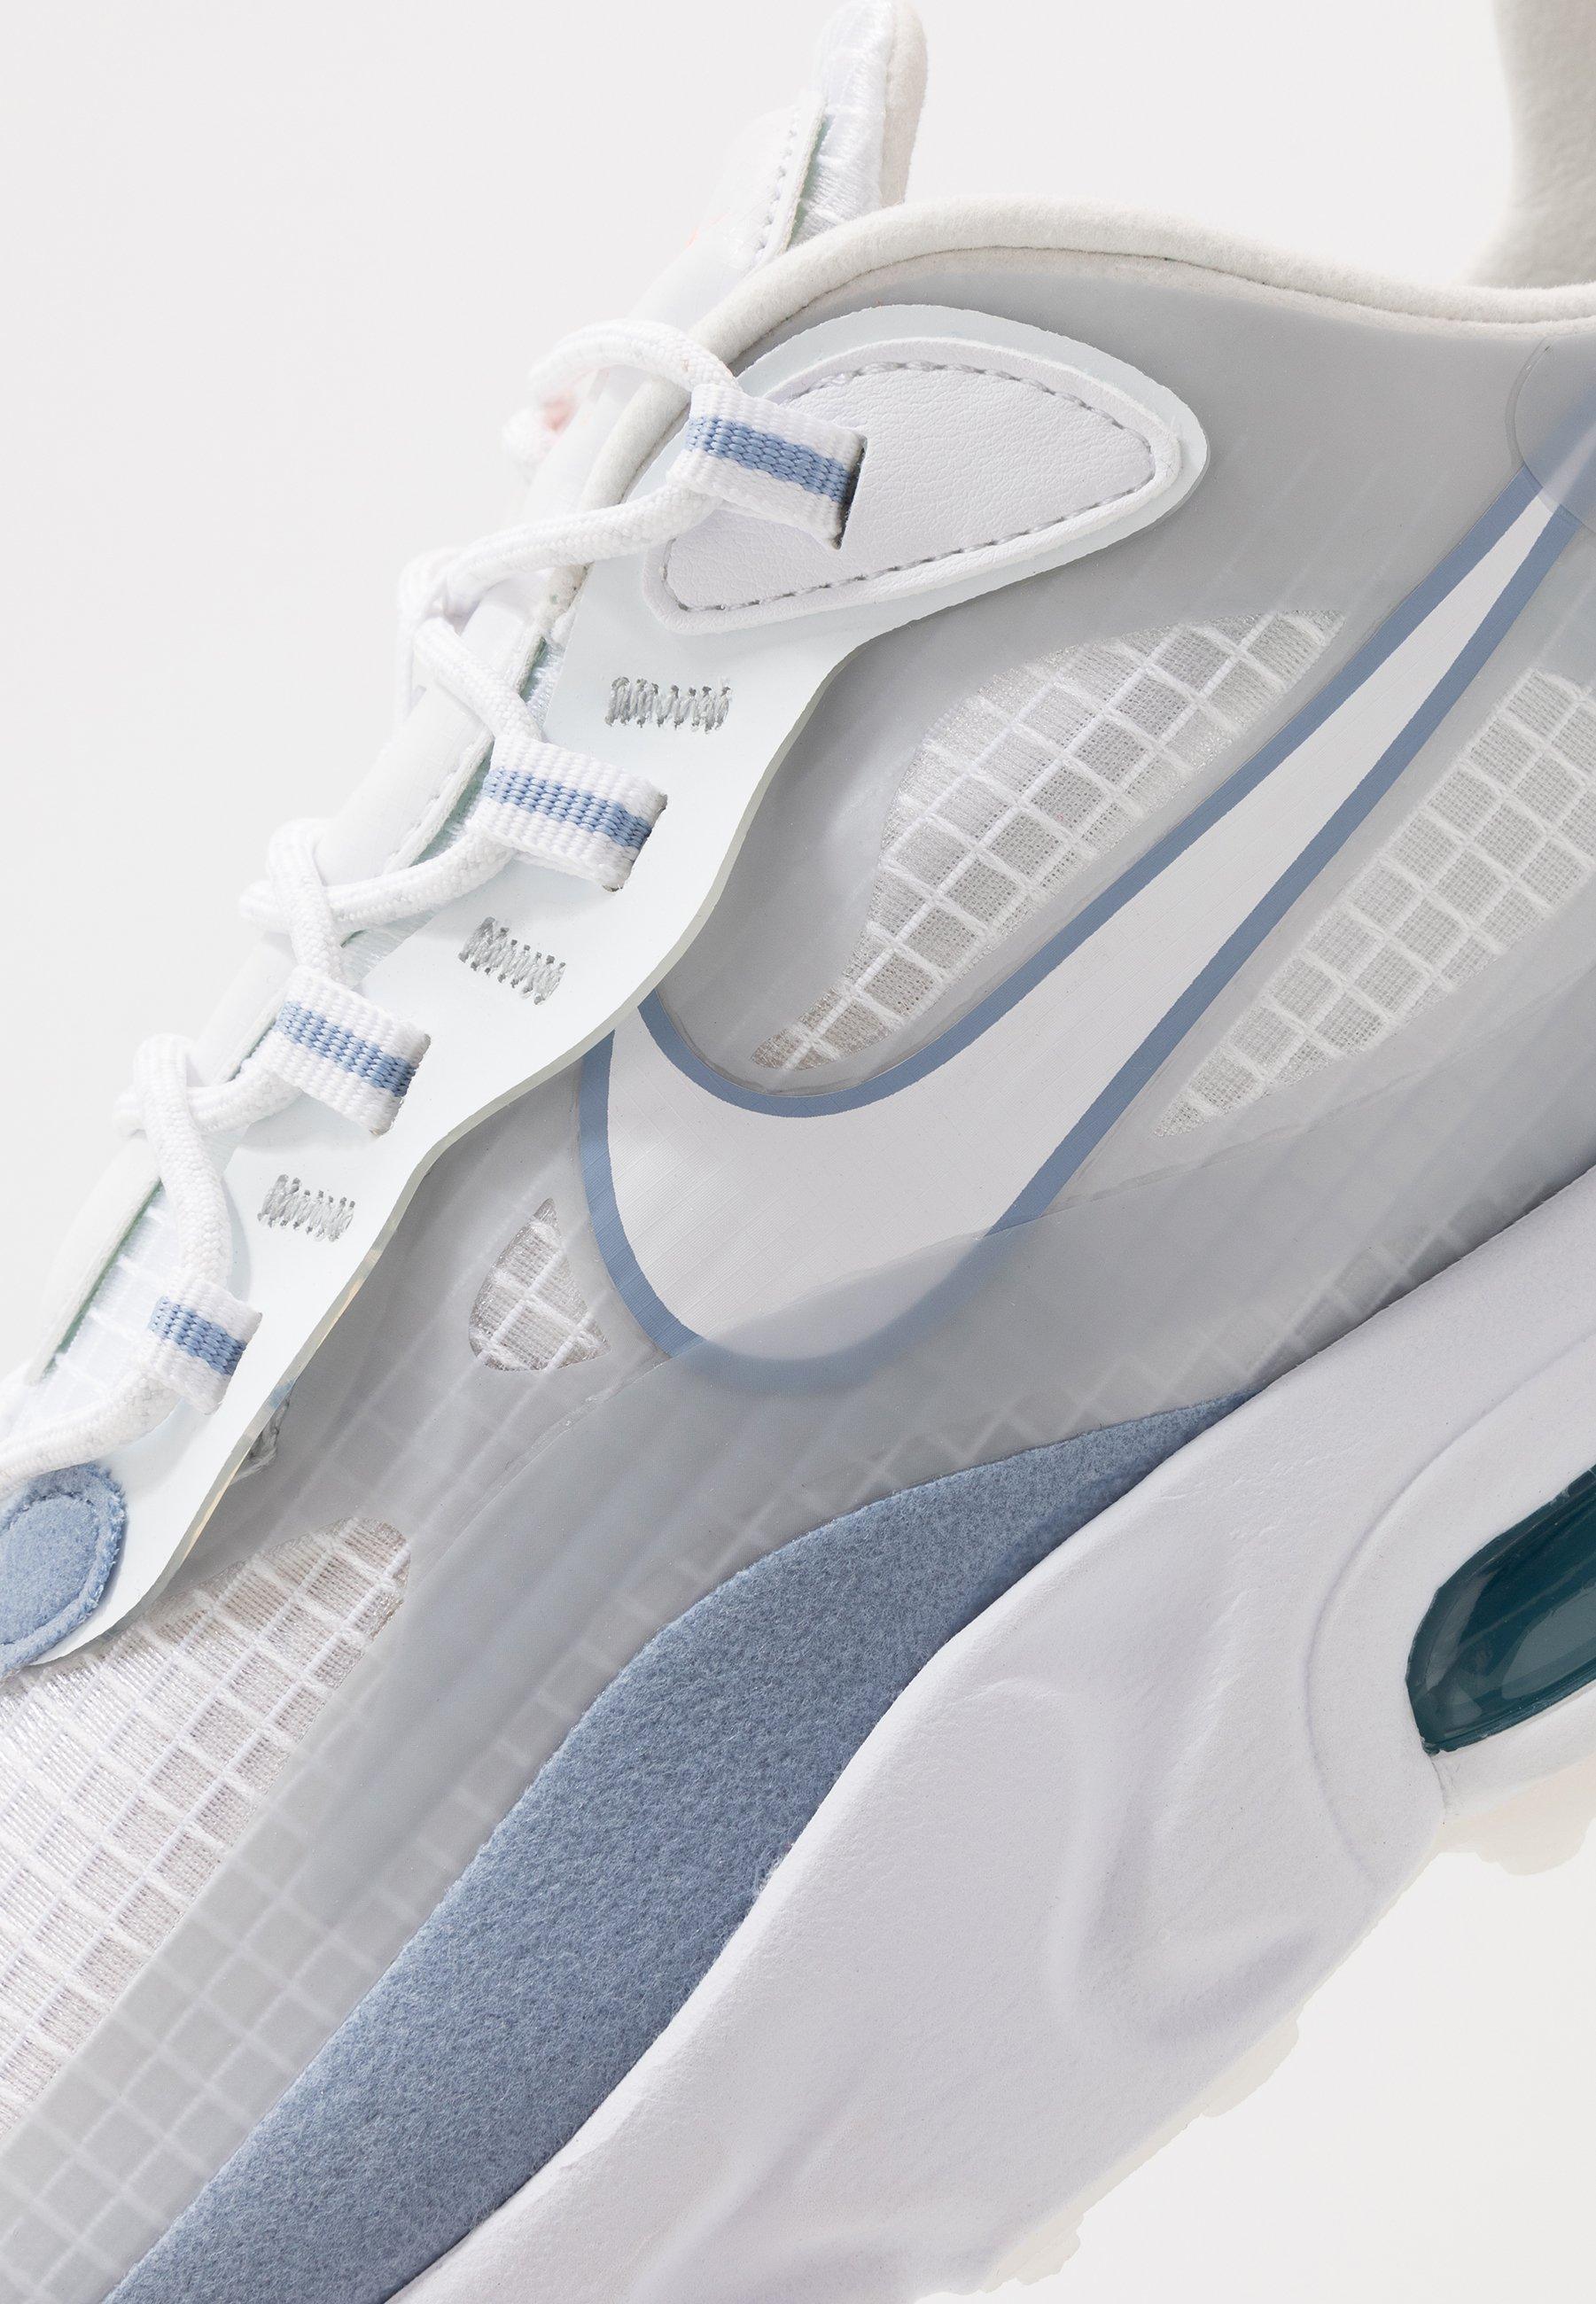 AIR MAX 270 REACT SE Sneakers whitepure platinumindigo foghyper crimson